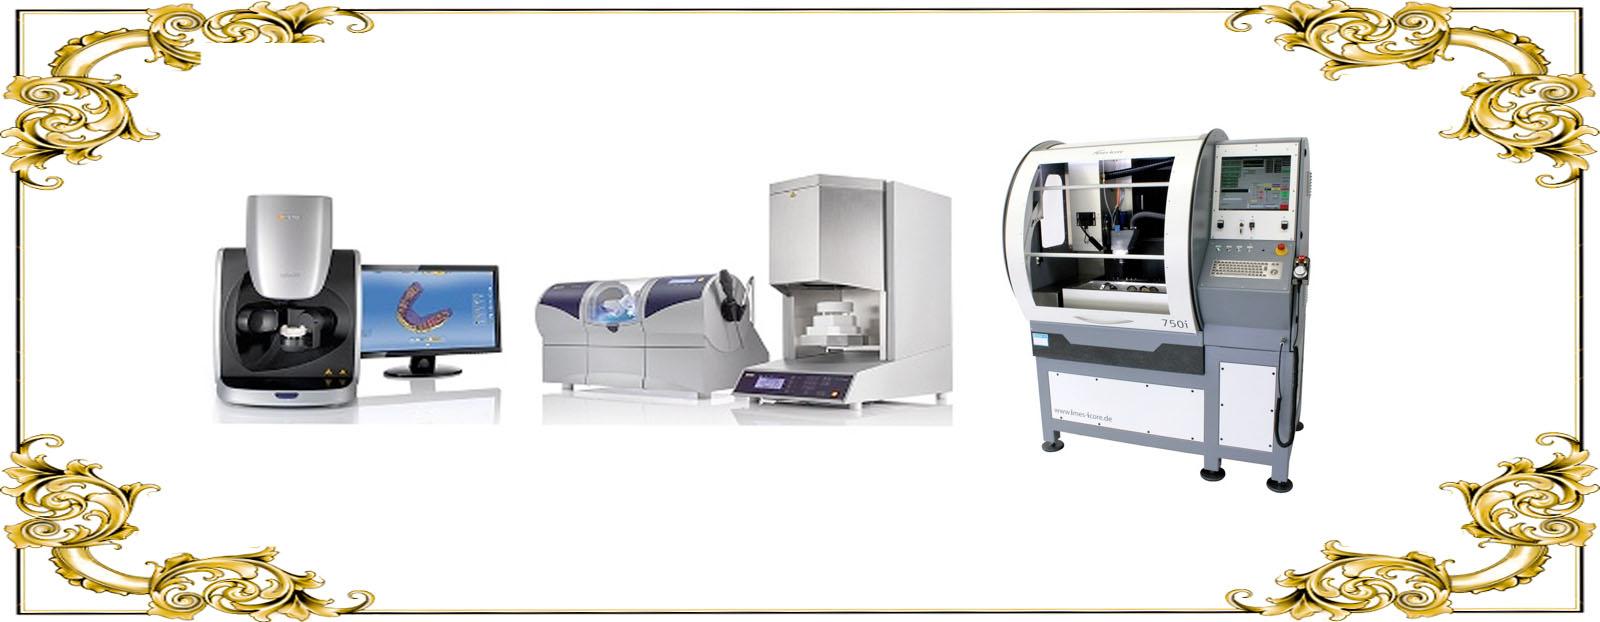 Cad And Cam Laboratory Equipment Sun Labtek Equipments